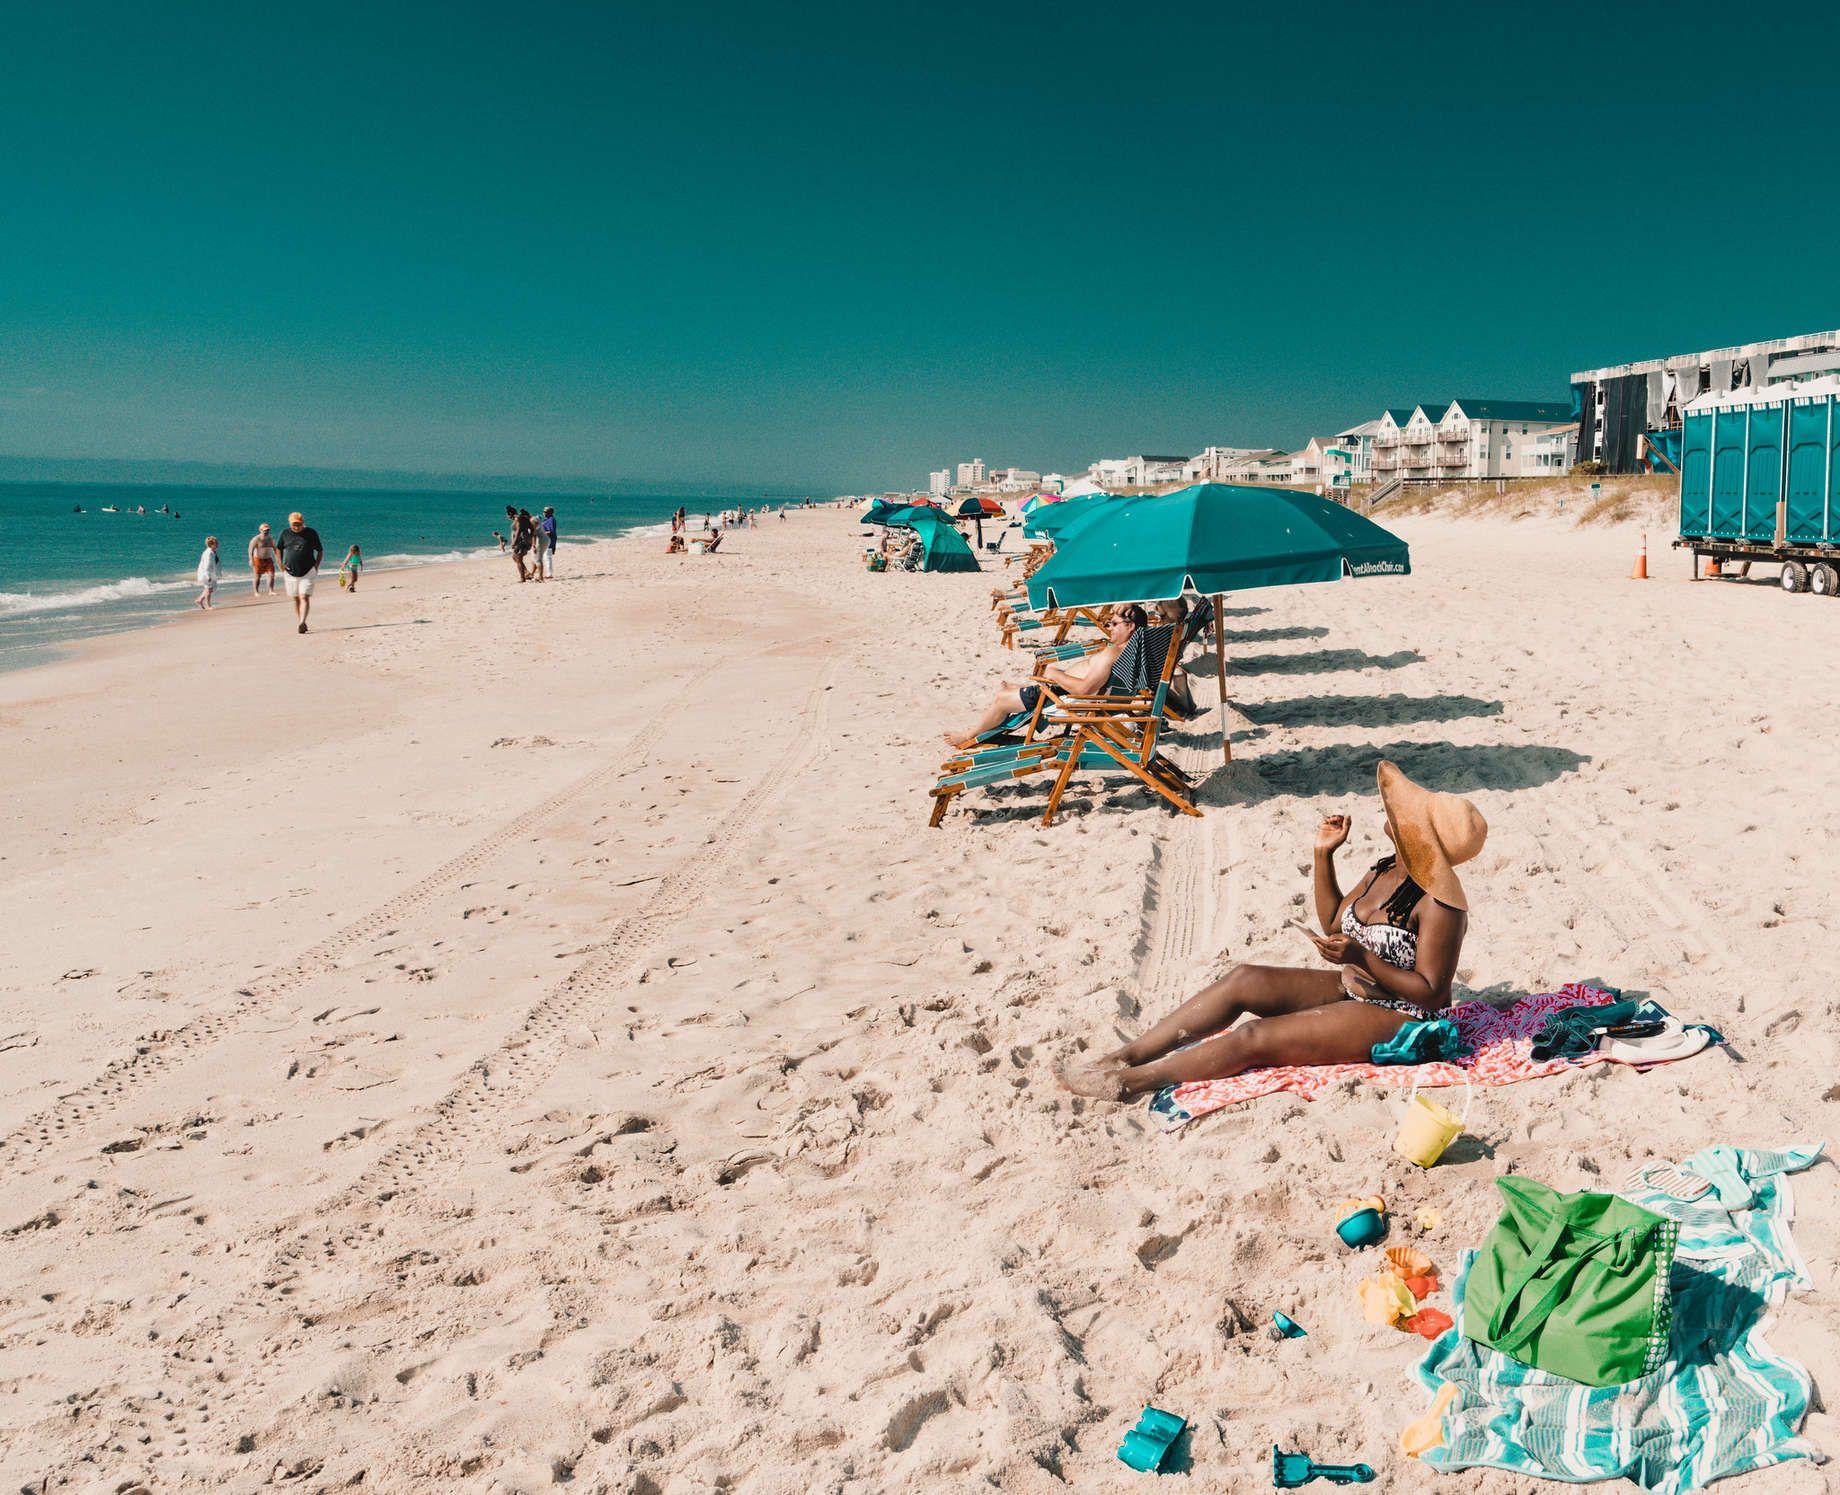 North carolina nude beaches - Naked photo